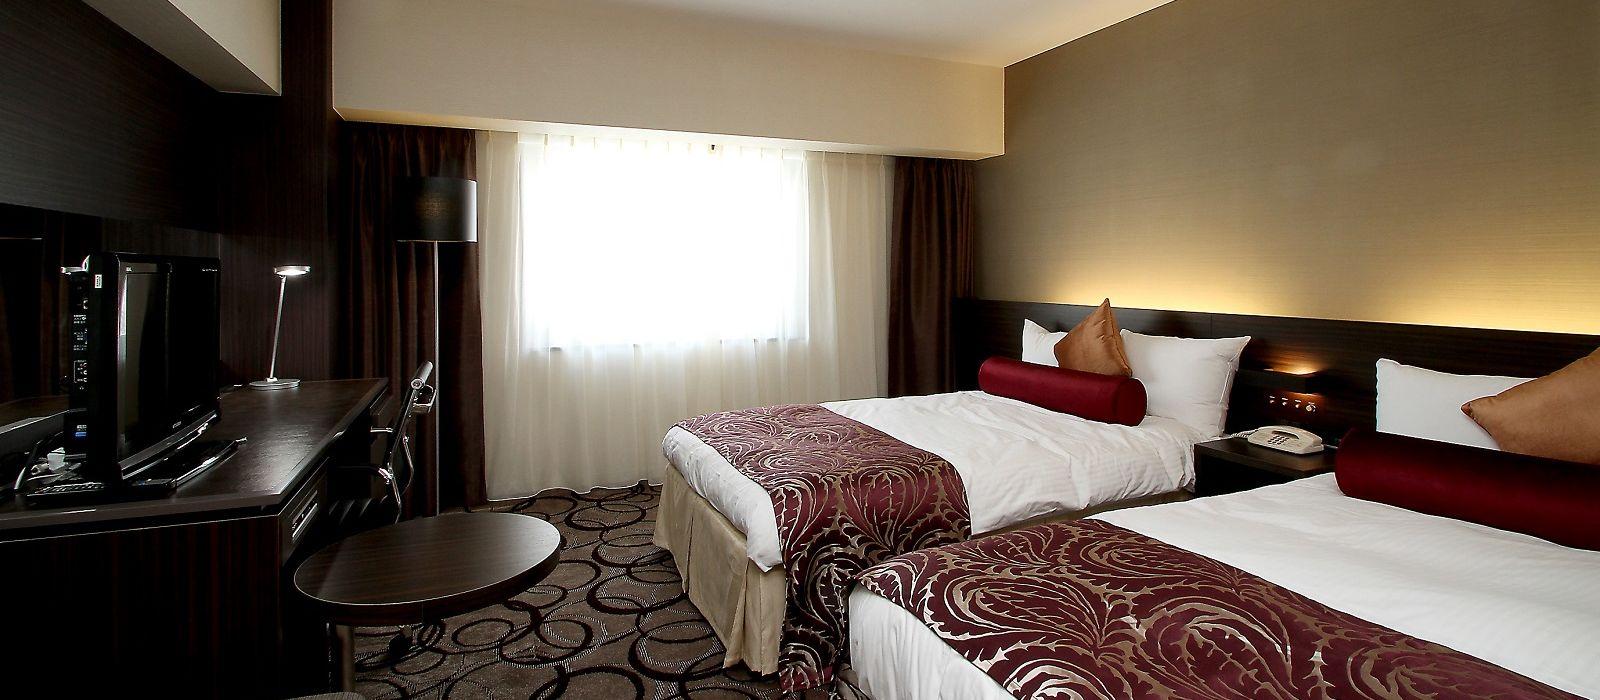 Hotel ANA Crowne Plaza  Kushiro Japan